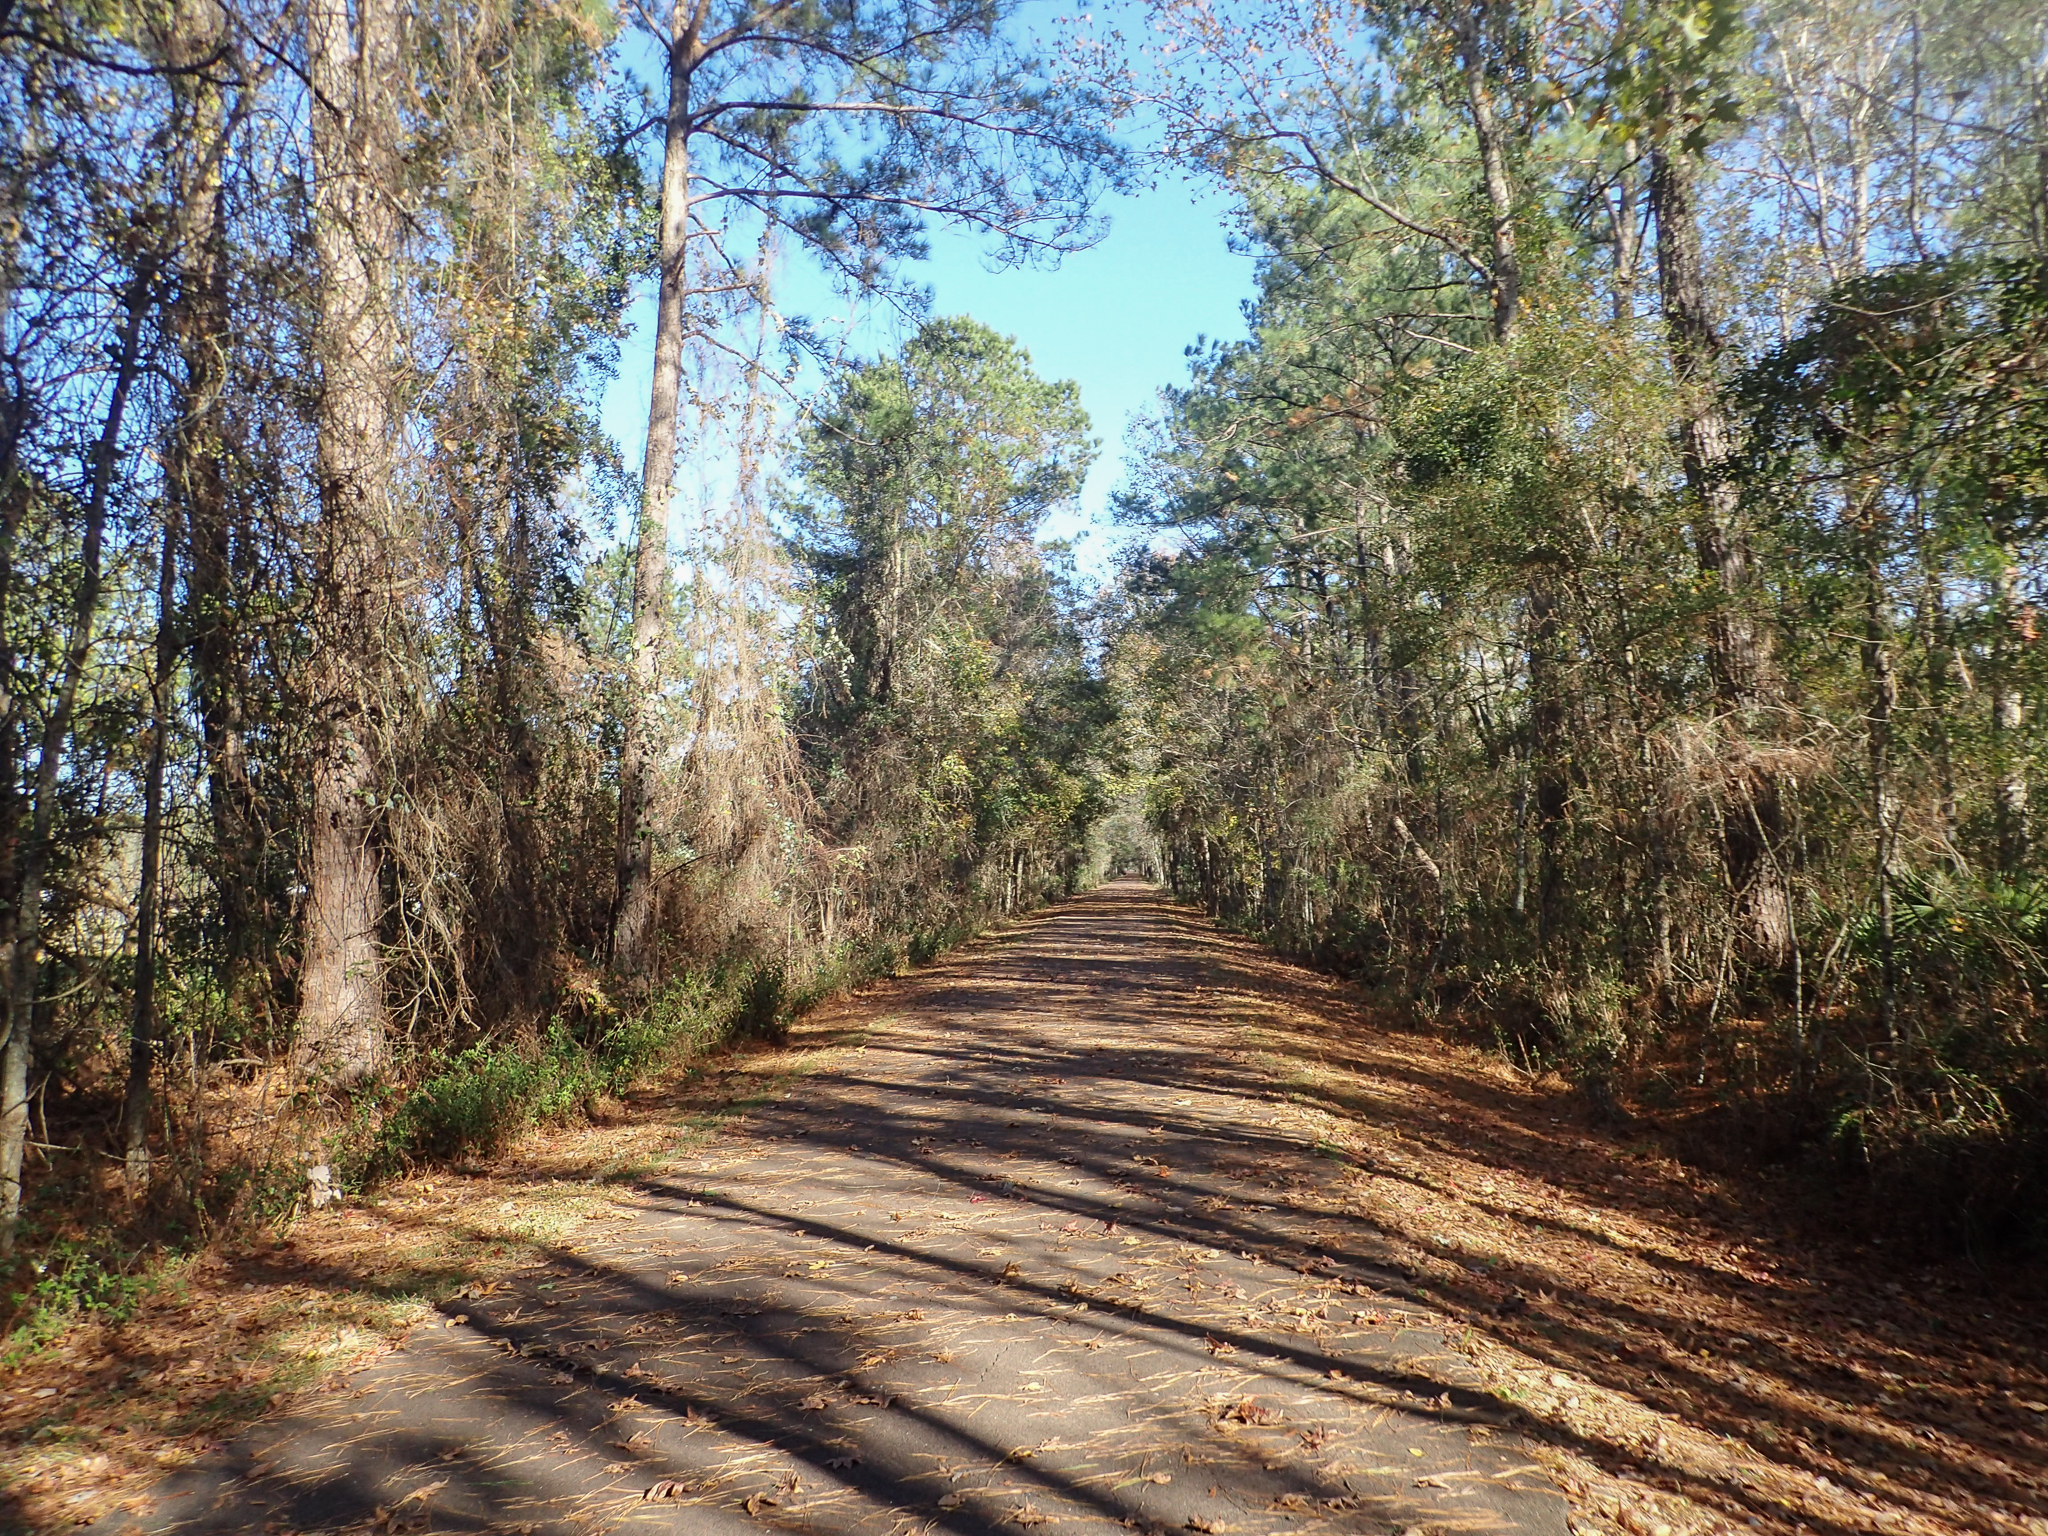 On the Baldwin Rail Trail, Florida